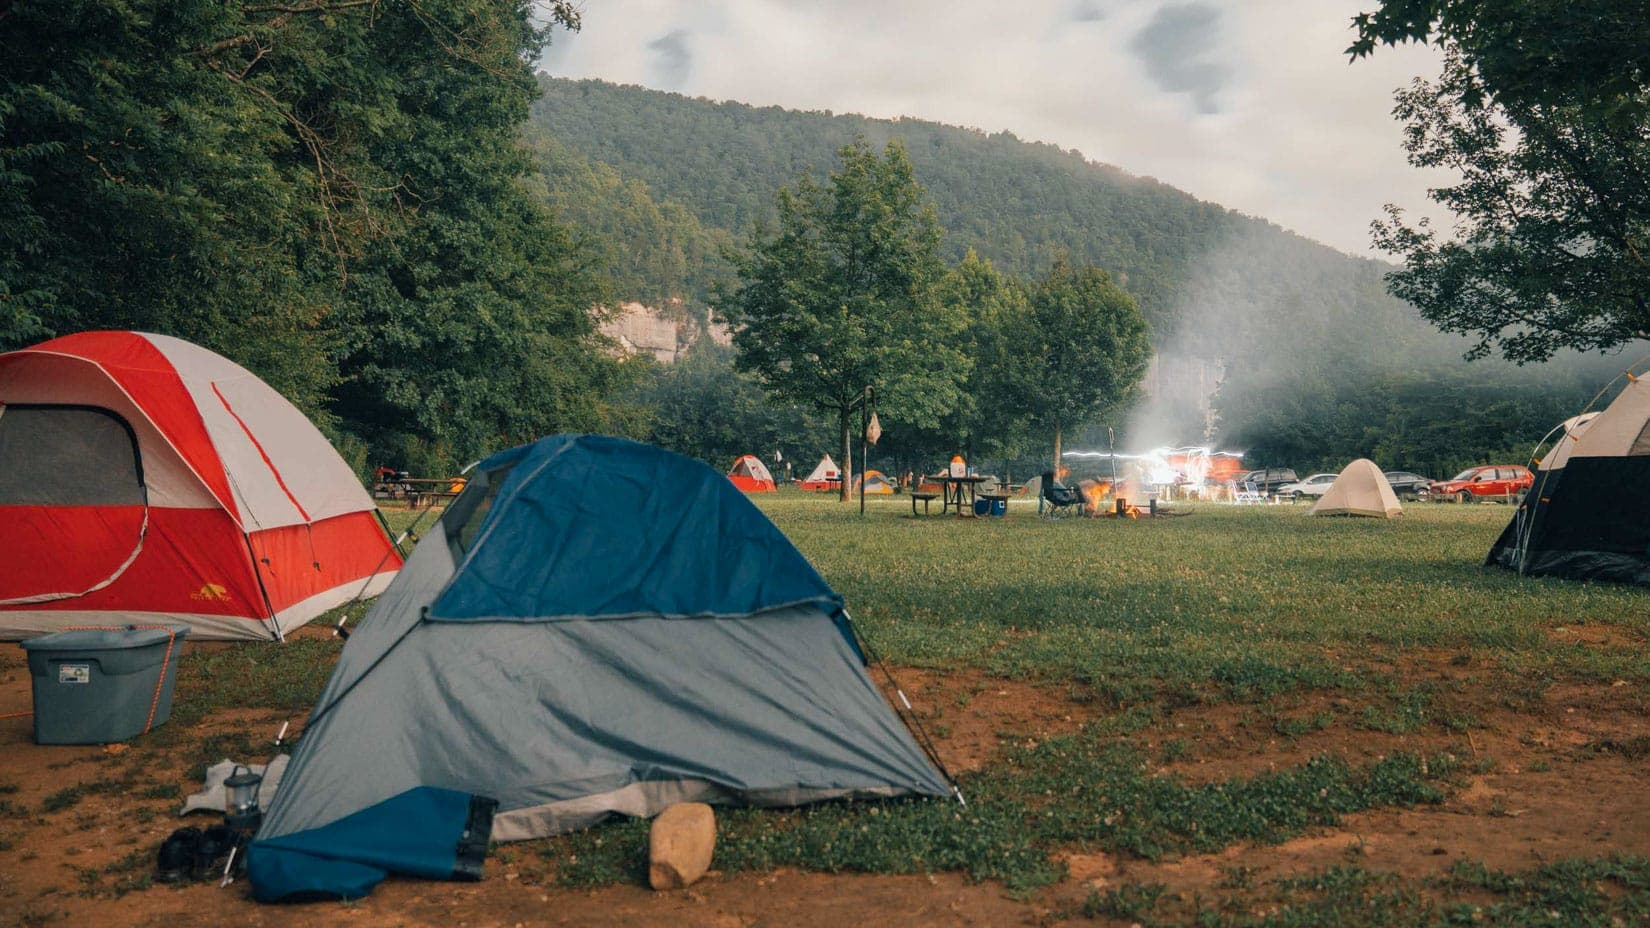 camping at steel creek